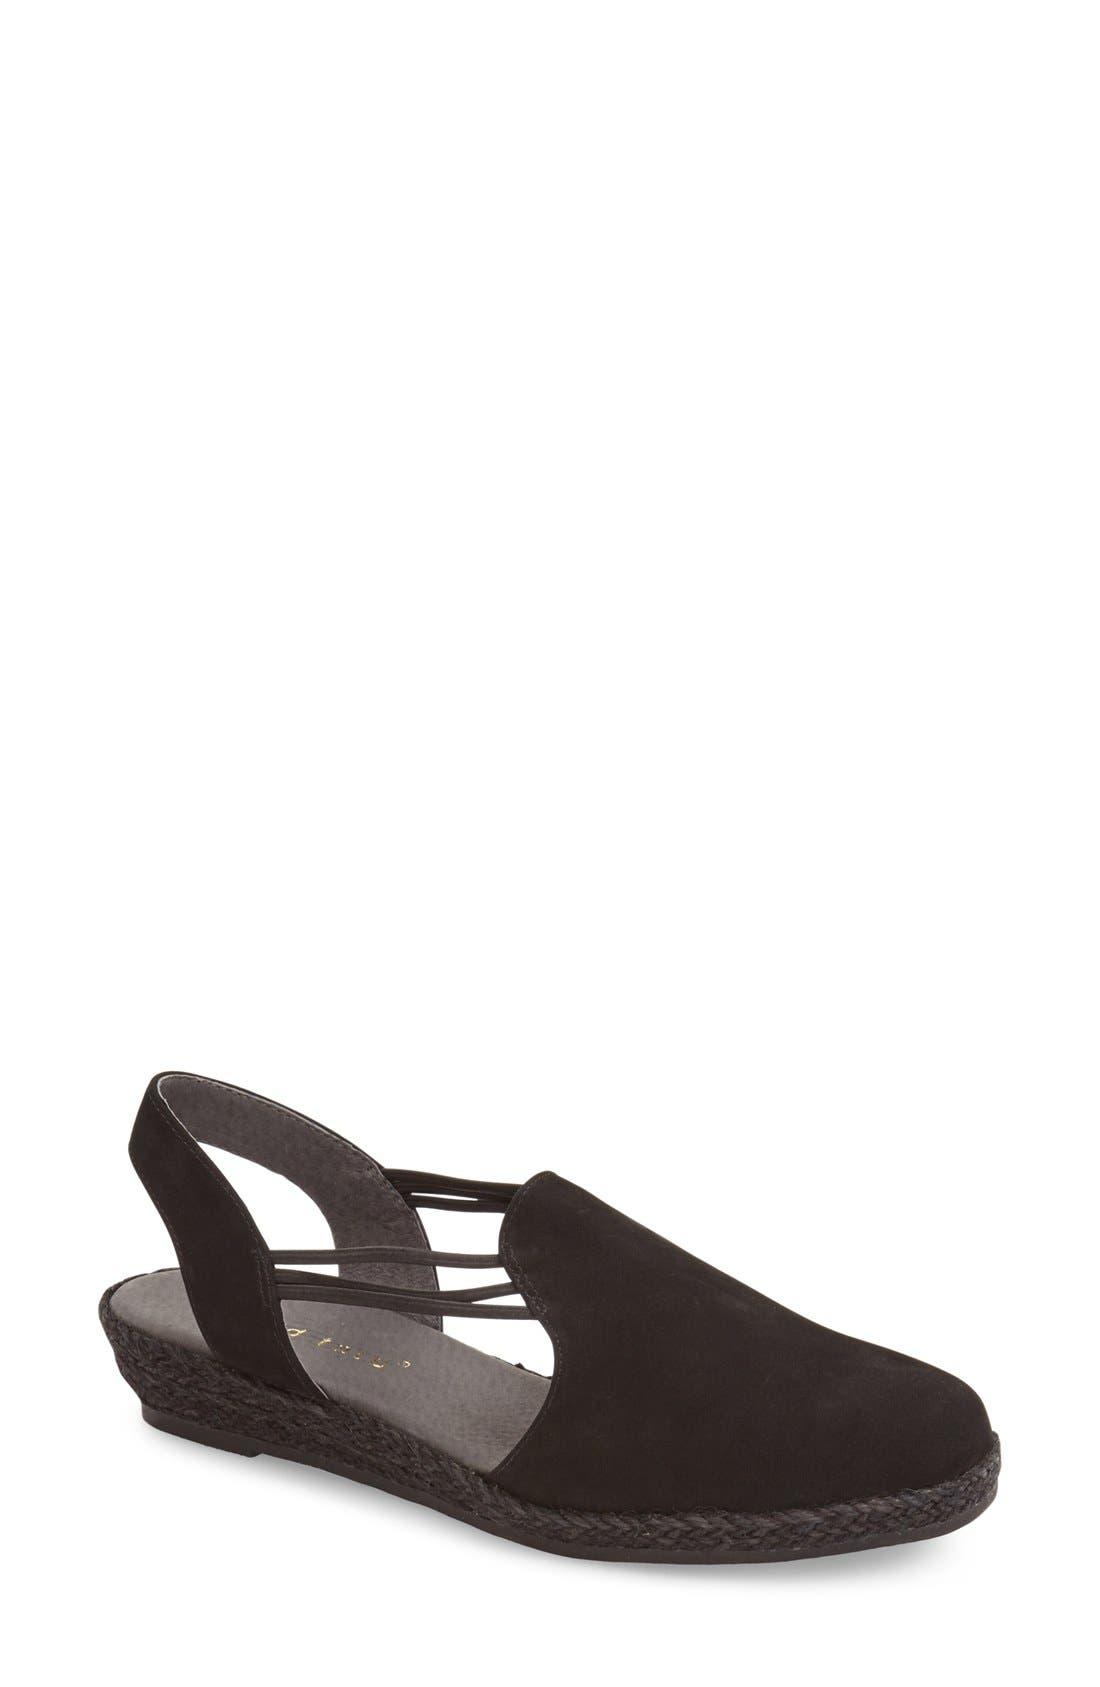 'Nelly' Slingback Wedge Sandal,                             Main thumbnail 1, color,                             BLACK NUBUCK